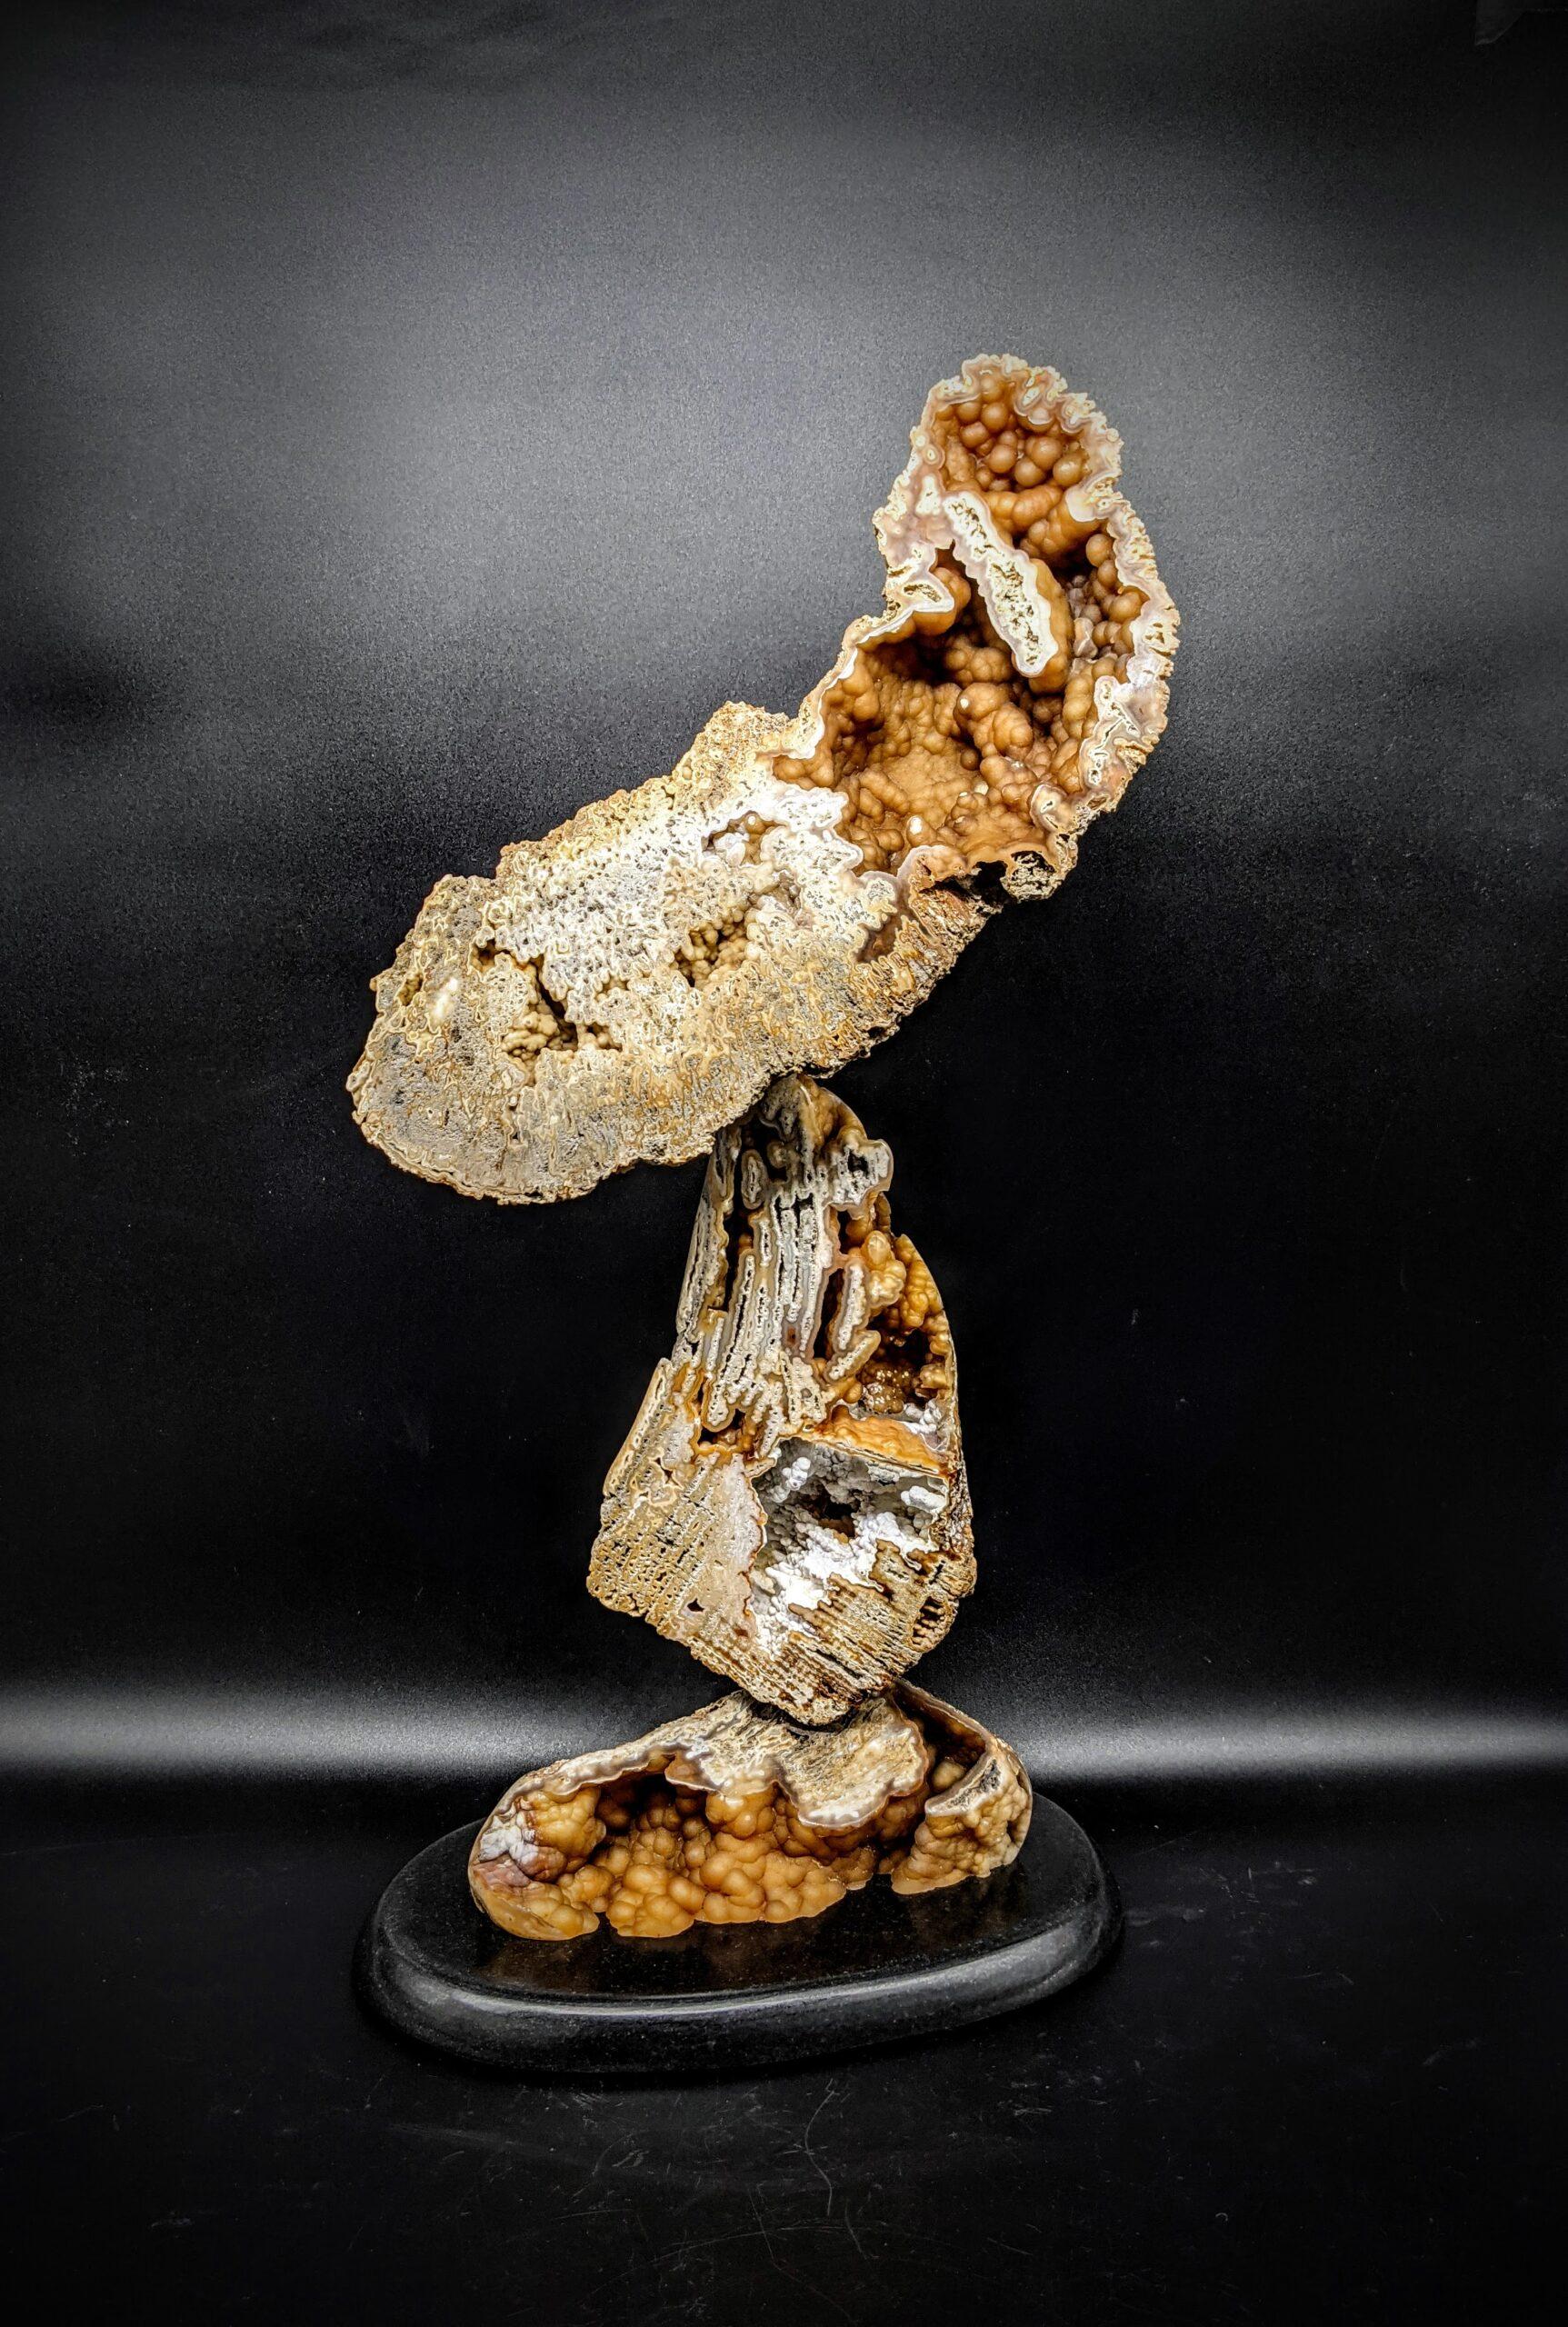 Agatized Coral Sculpture